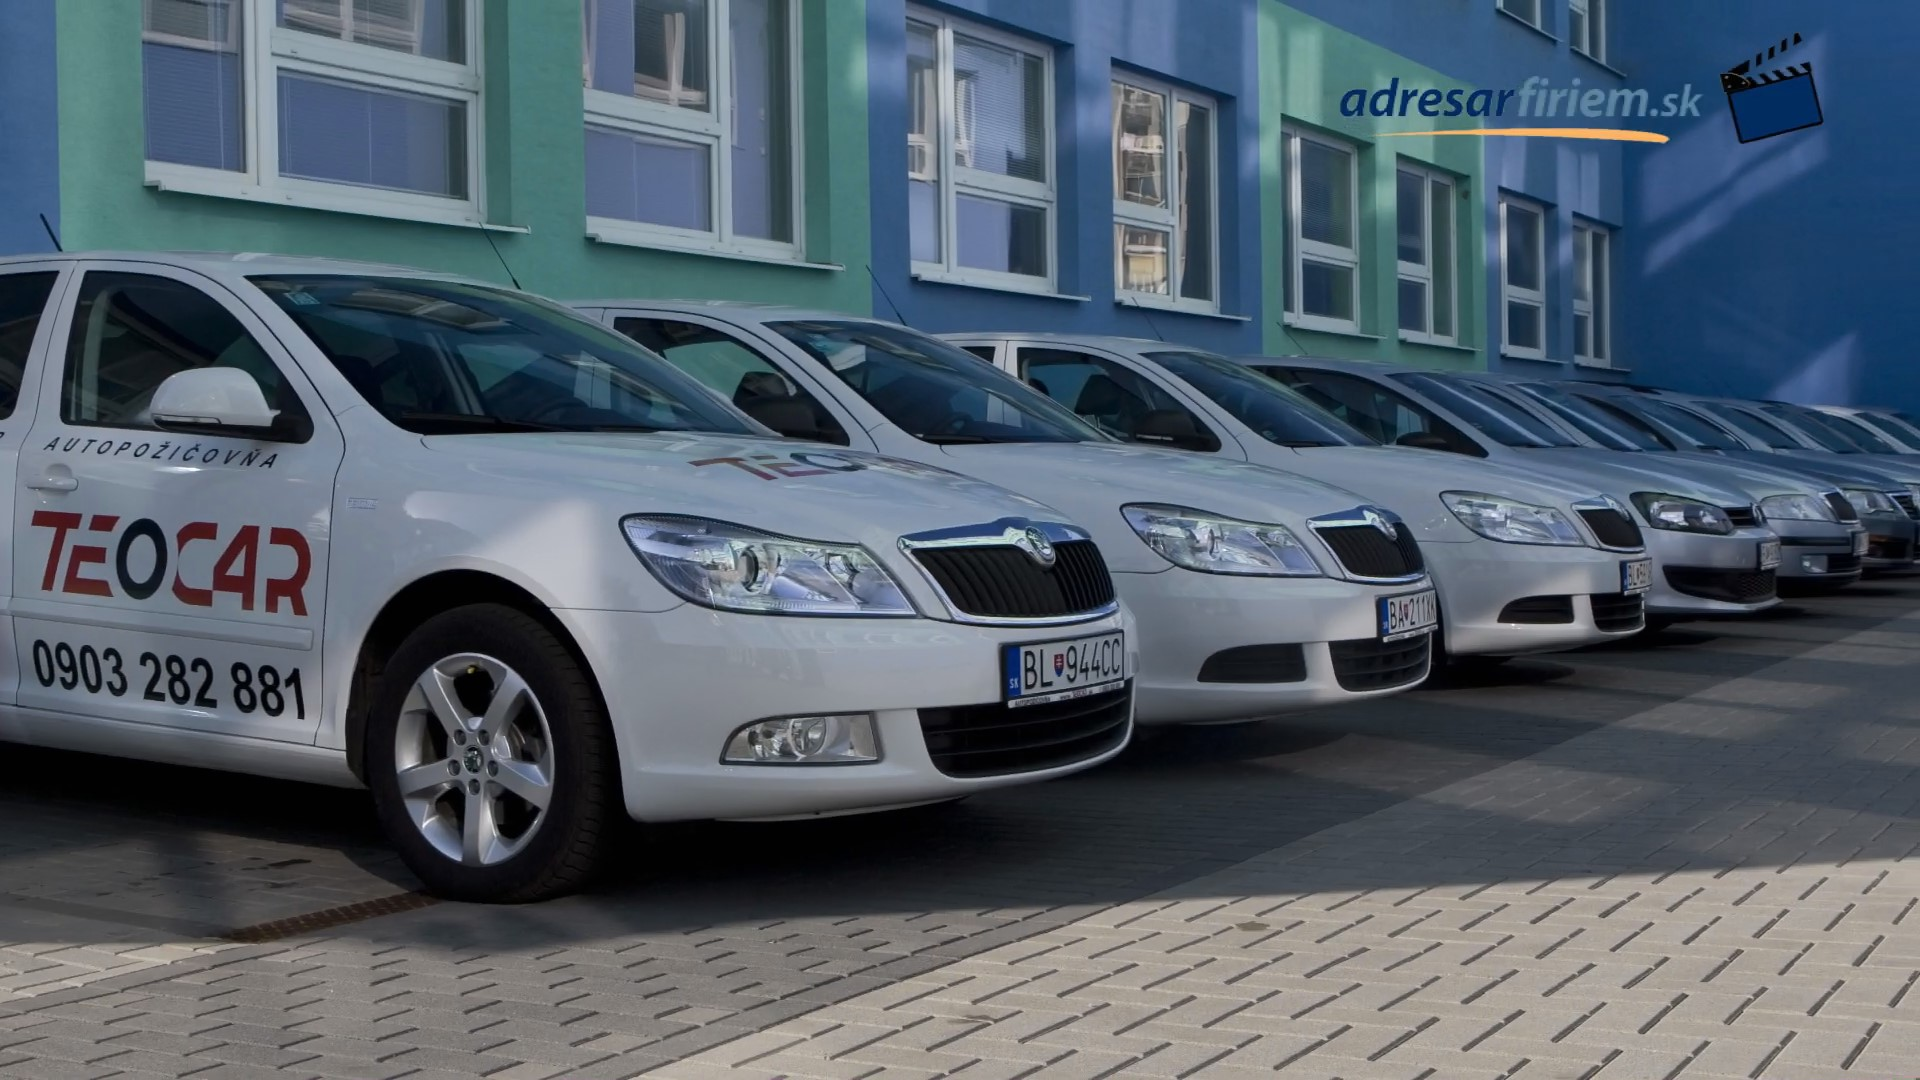 Video Autopožičovňa TEOCAR Bratislava